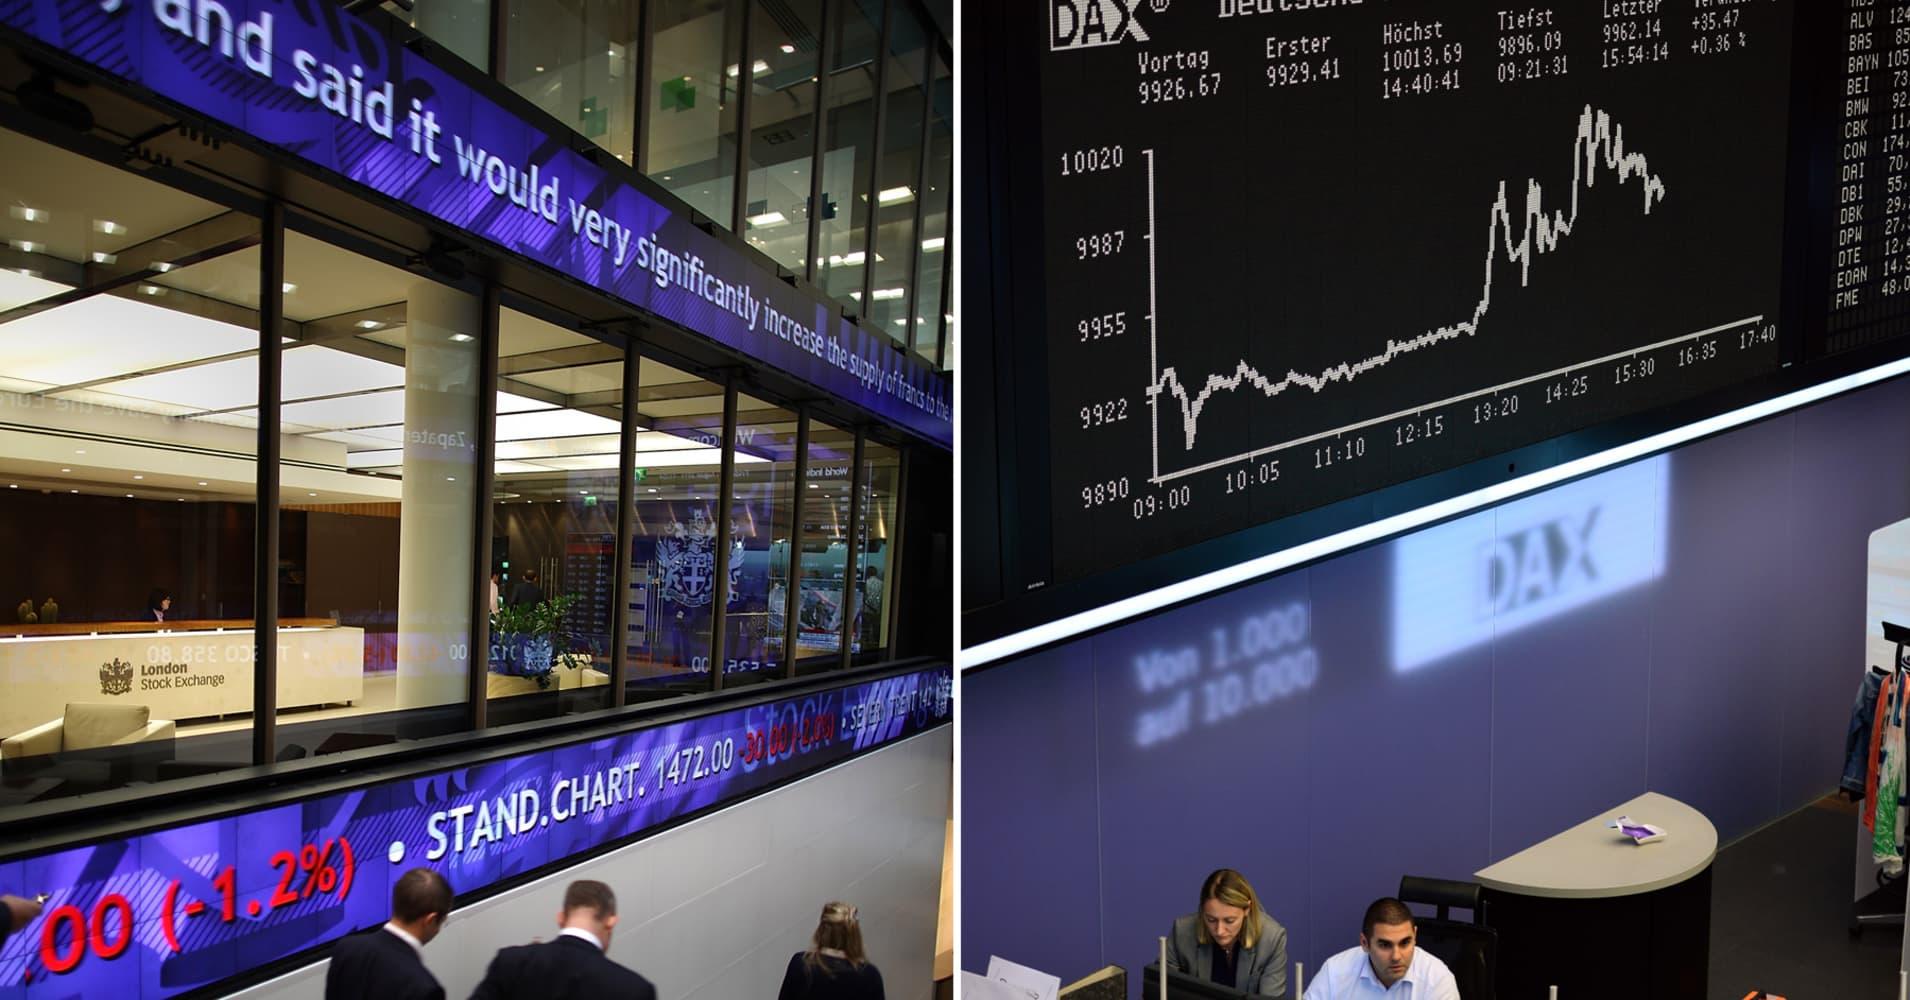 LSE-Deutsche Börse's $31 billion merger in doubt as UK exchange says it won't meet disposal deadline